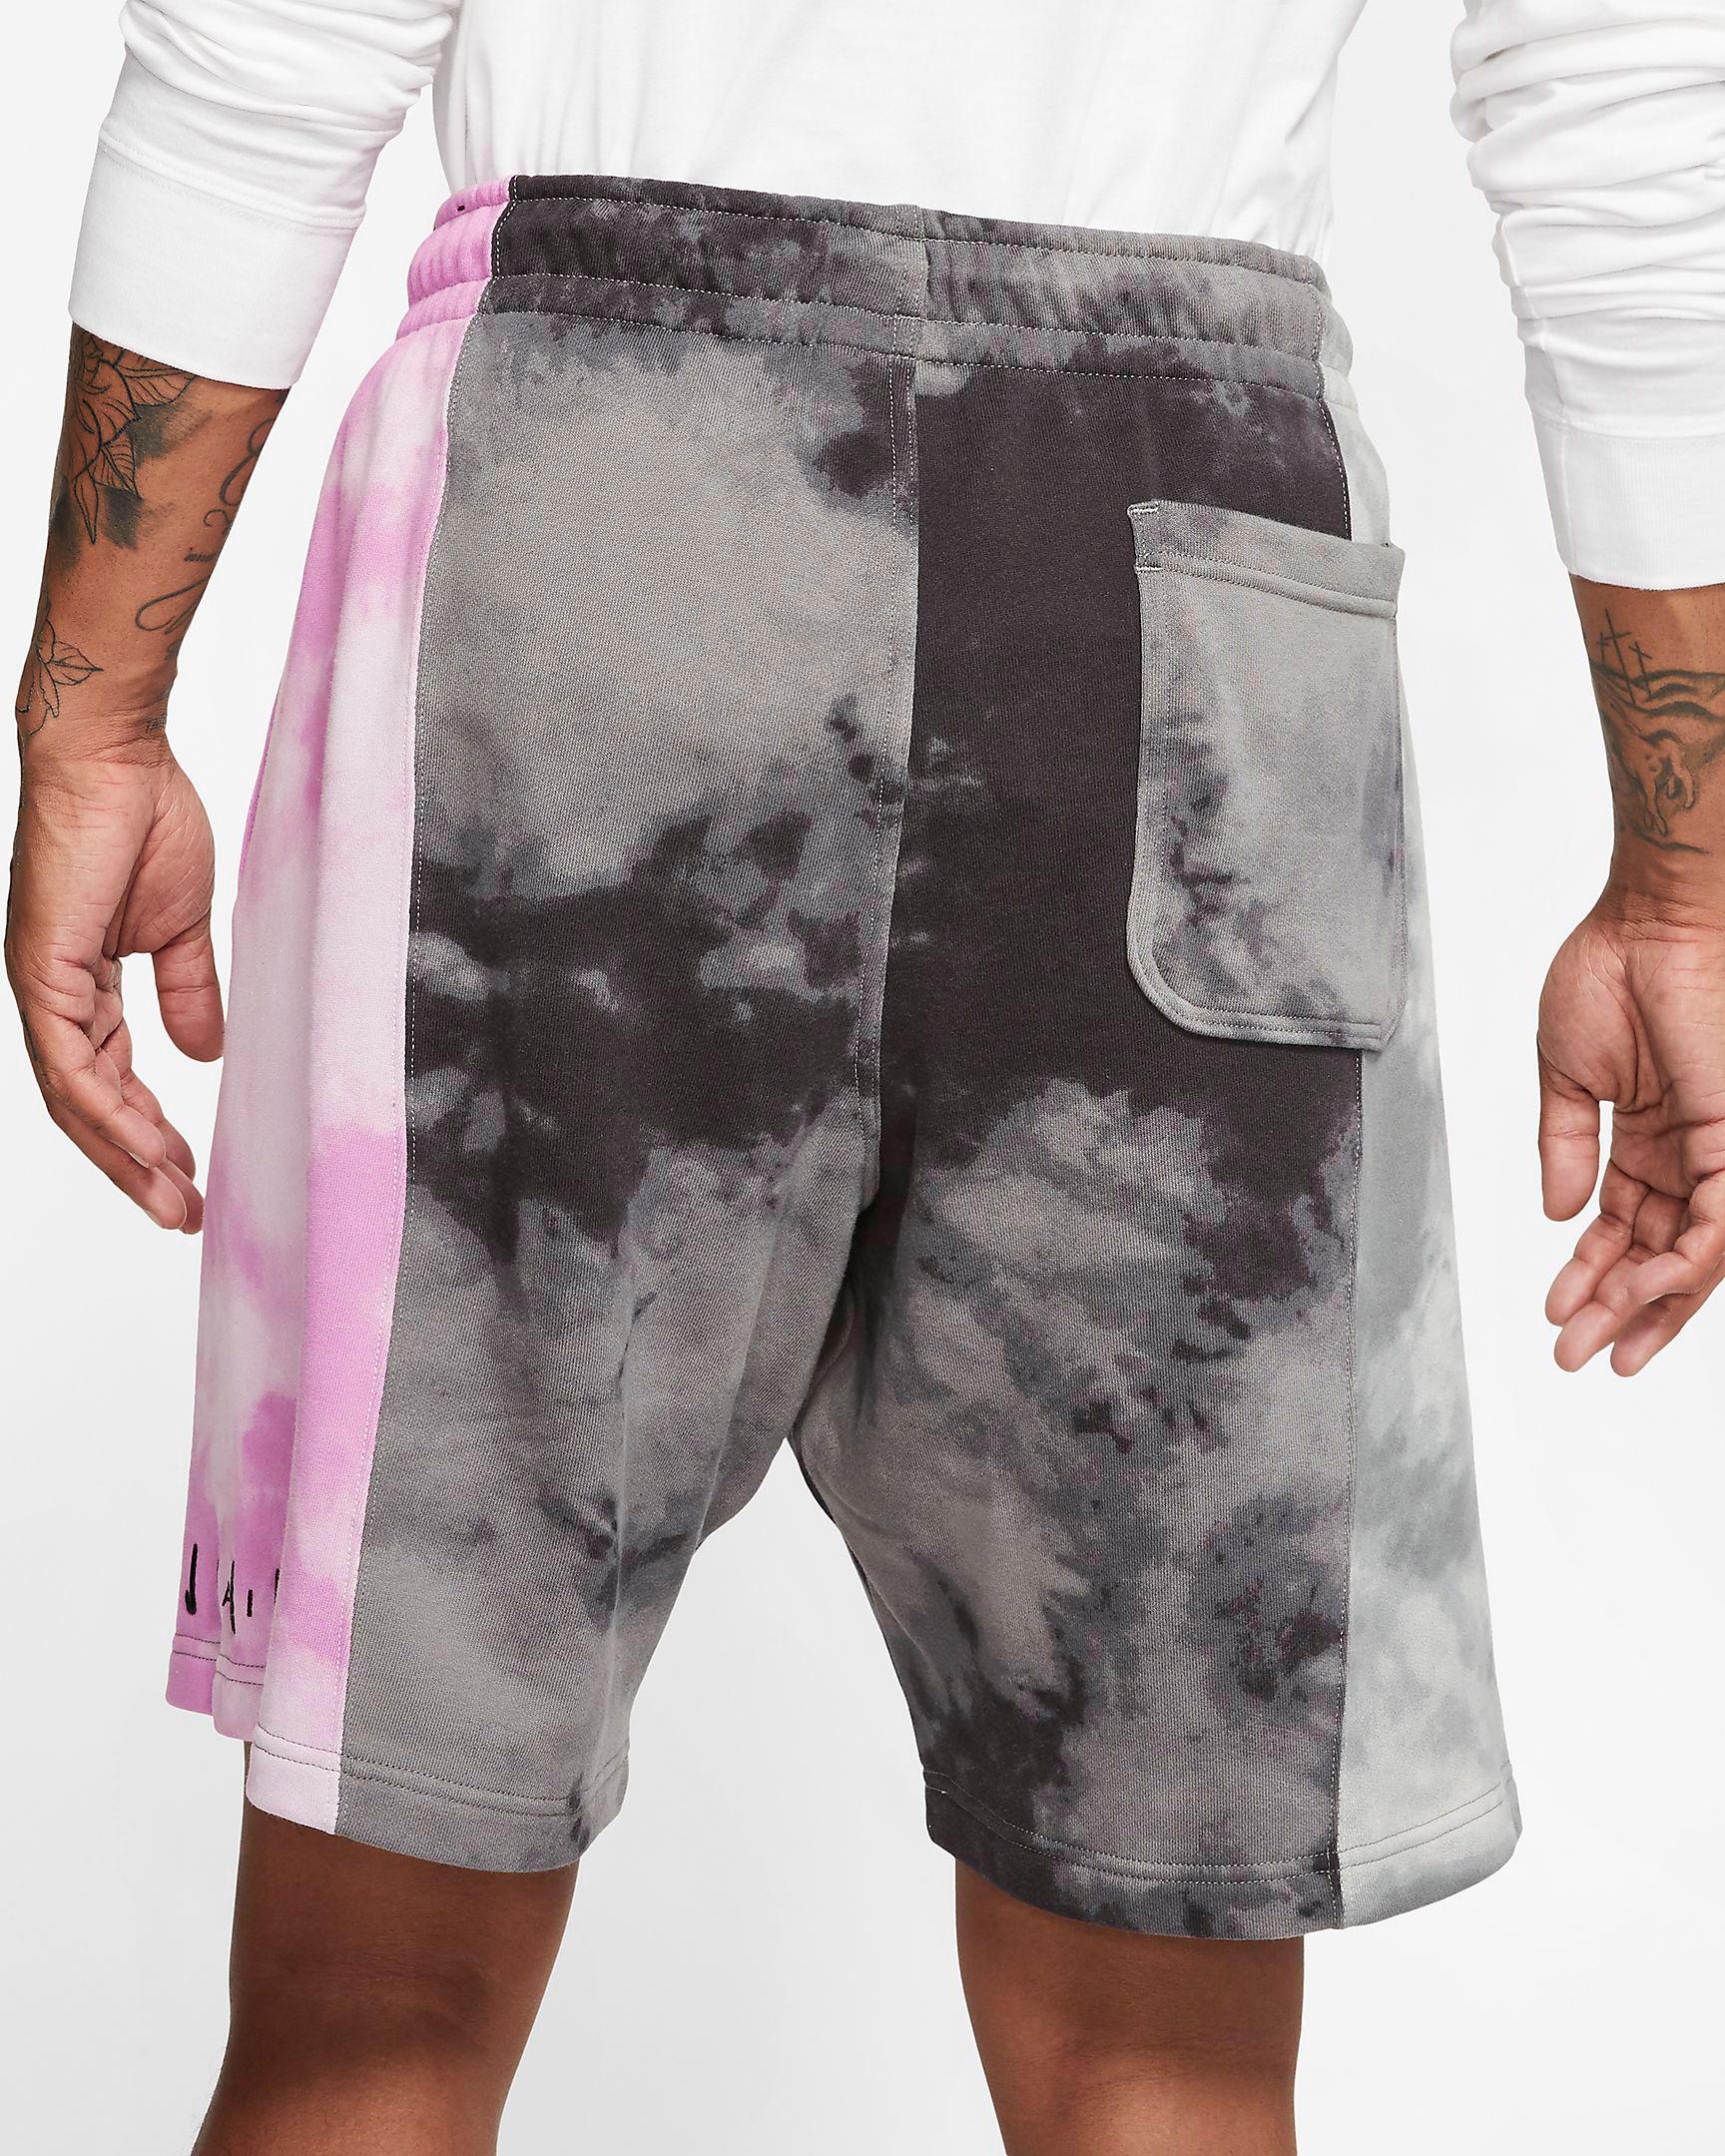 jordan-9-black-smoke-grey-shorts-2